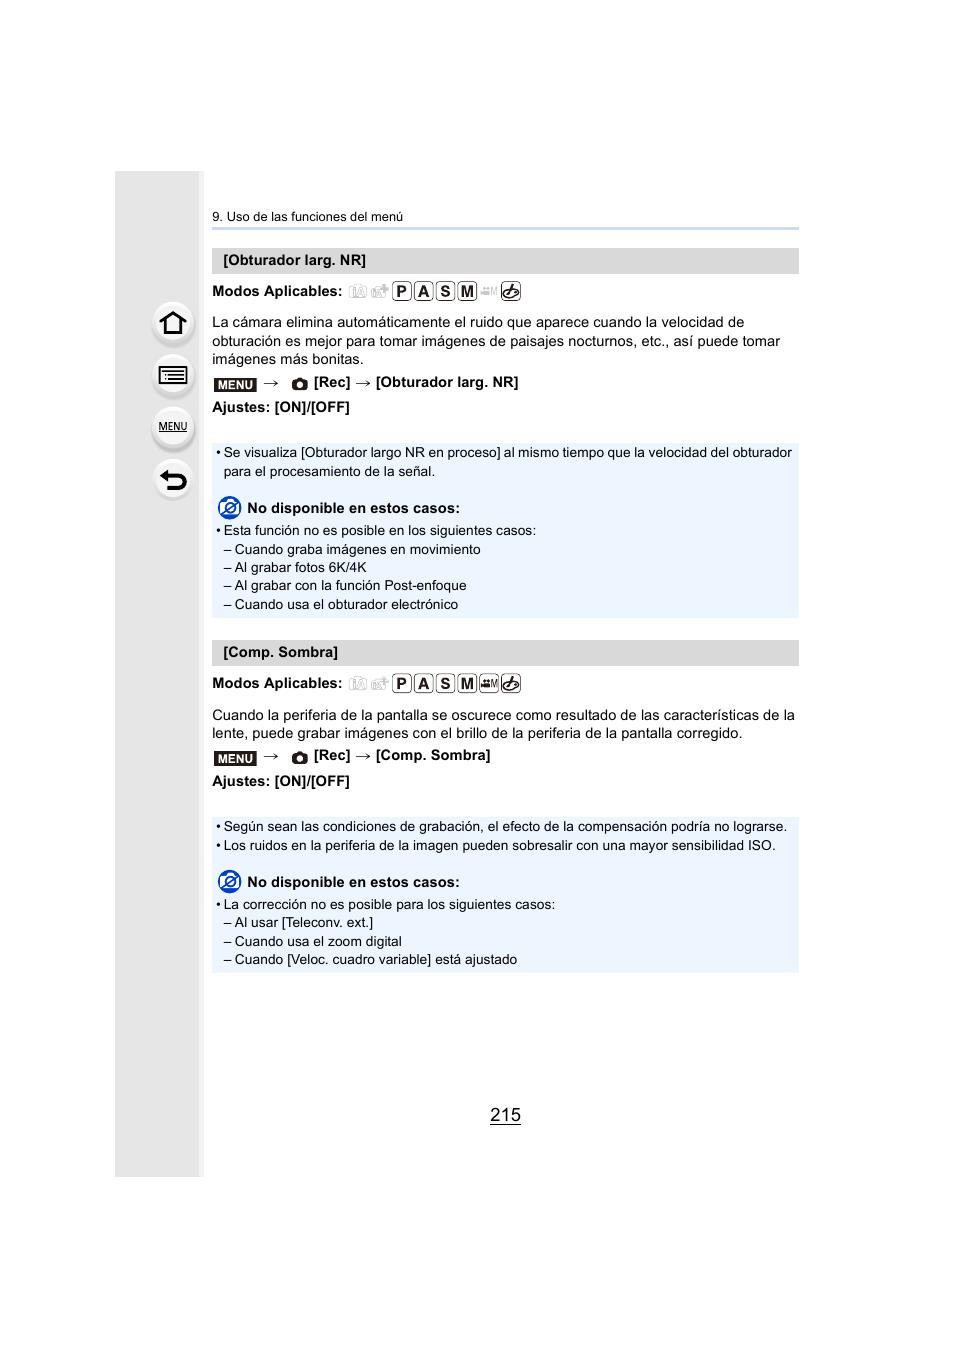 P215, P215) | Panasonic Lumix GH5 Manual del usuario | Página 215 / 347